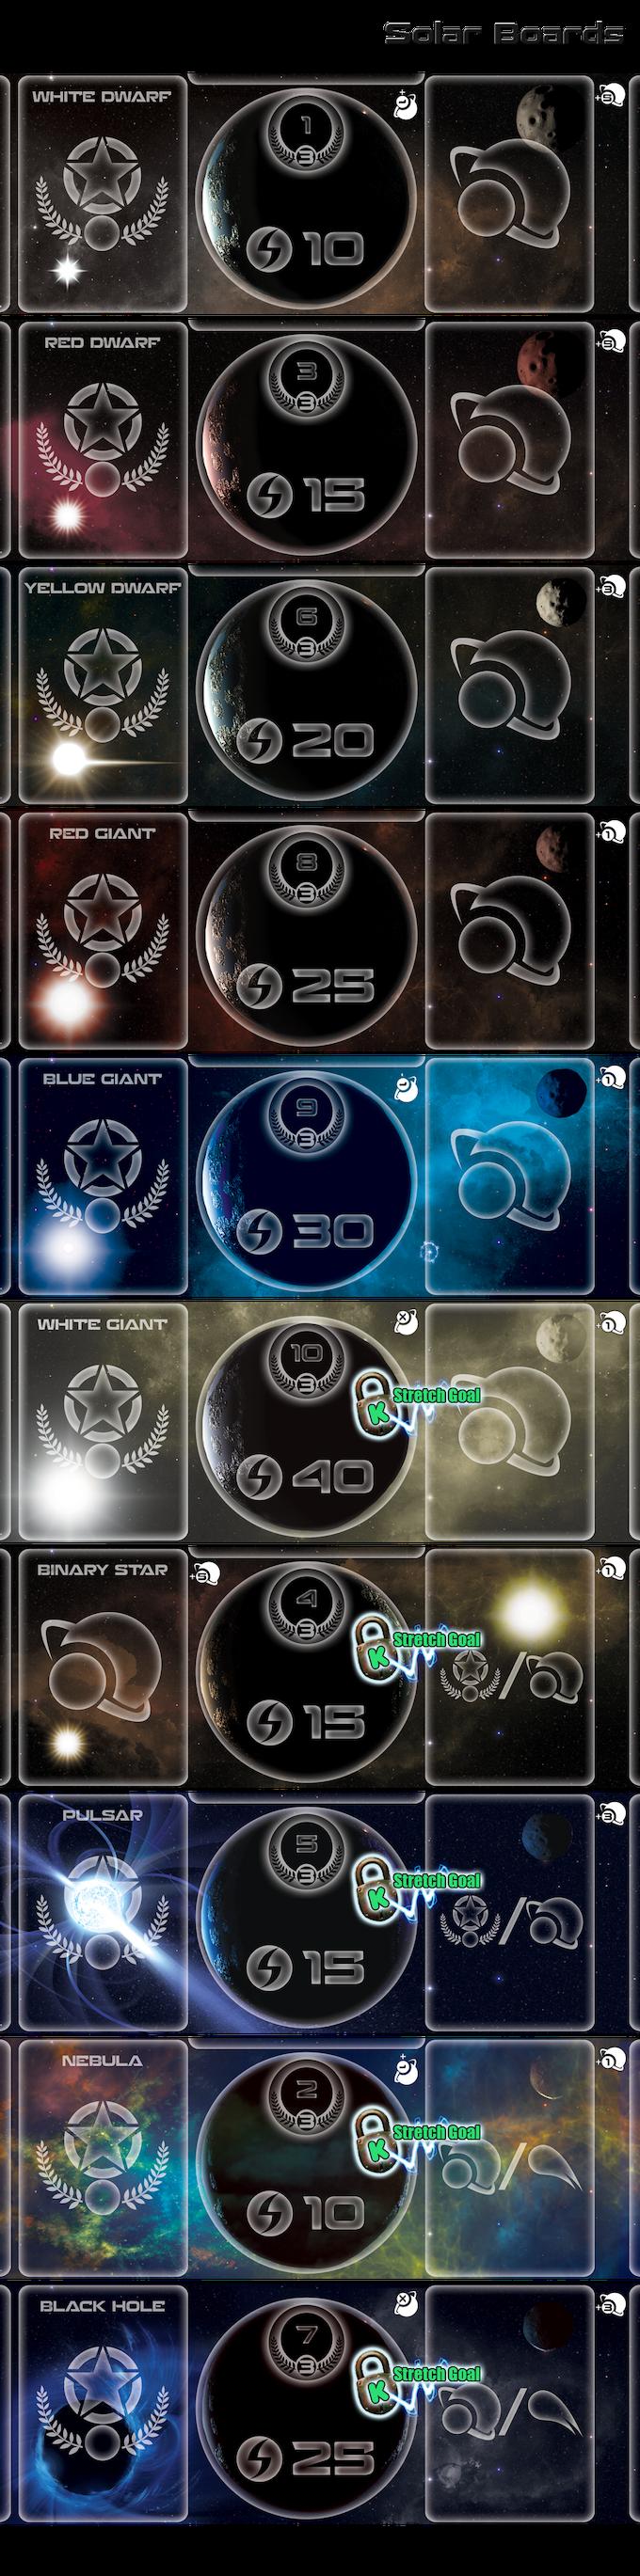 Solar Boards gameplay update